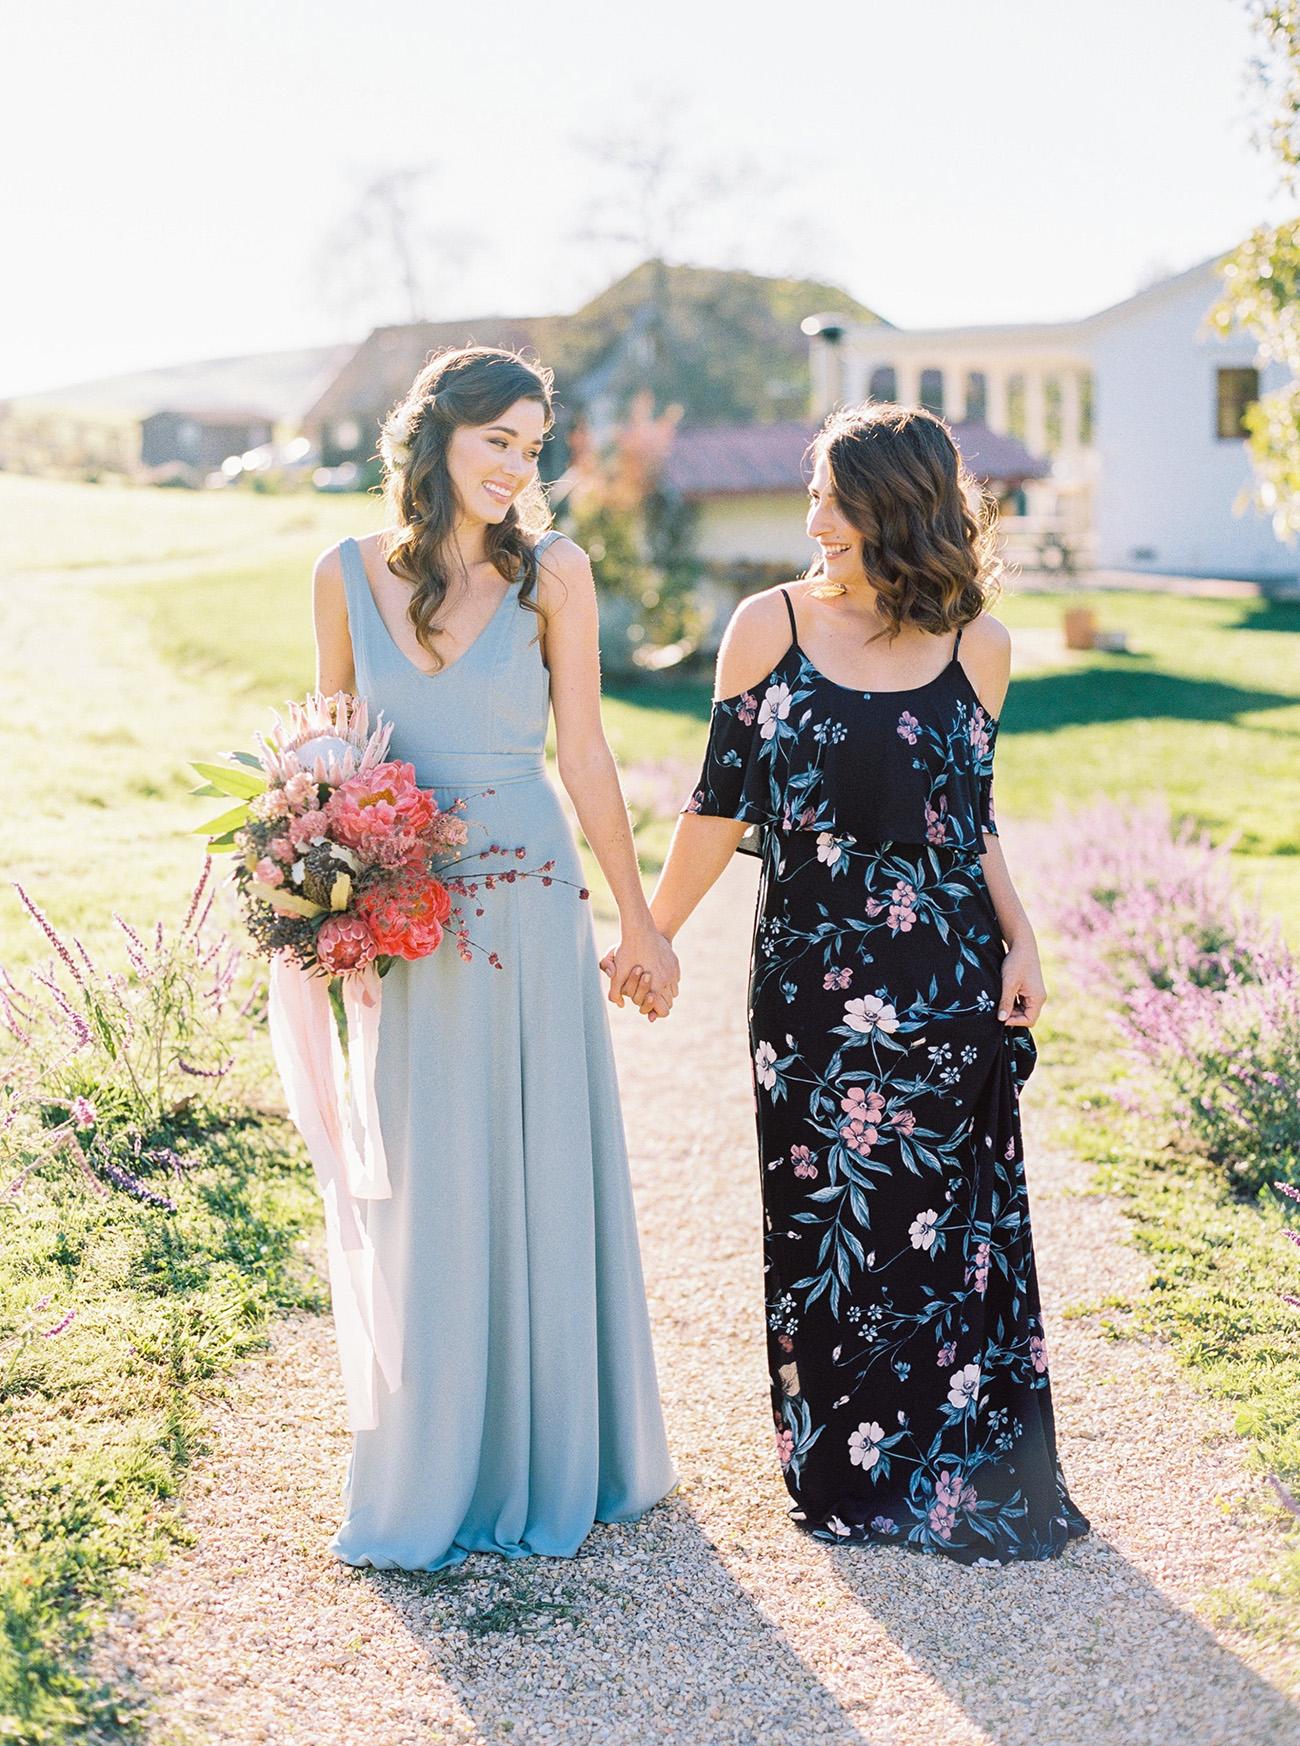 gwsxmumu bridesmaid dress collection